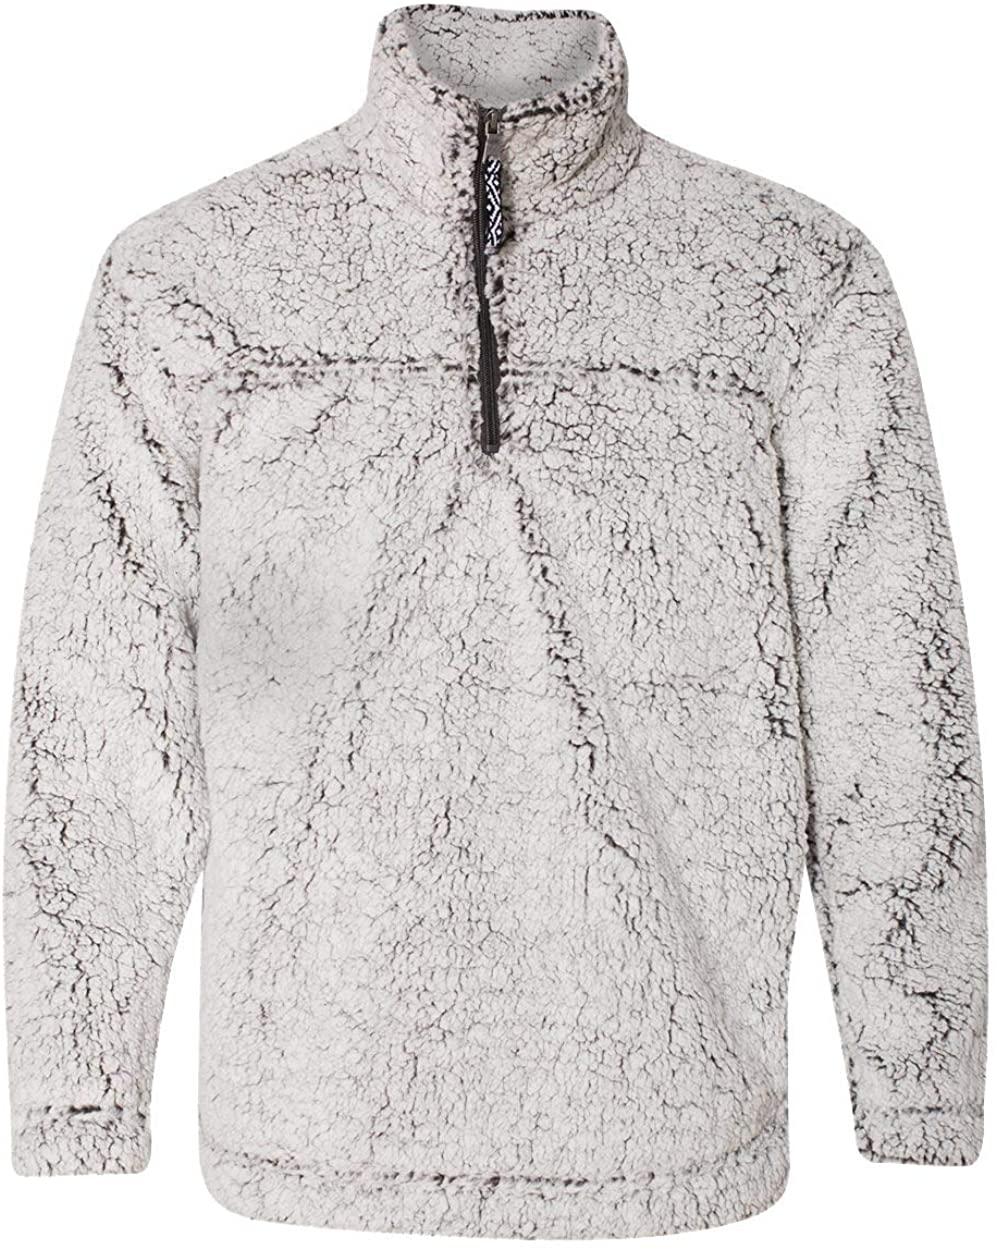 CAVU Frosty Grey Unisex Sherpa Fleece Quarter-Zip Pullover